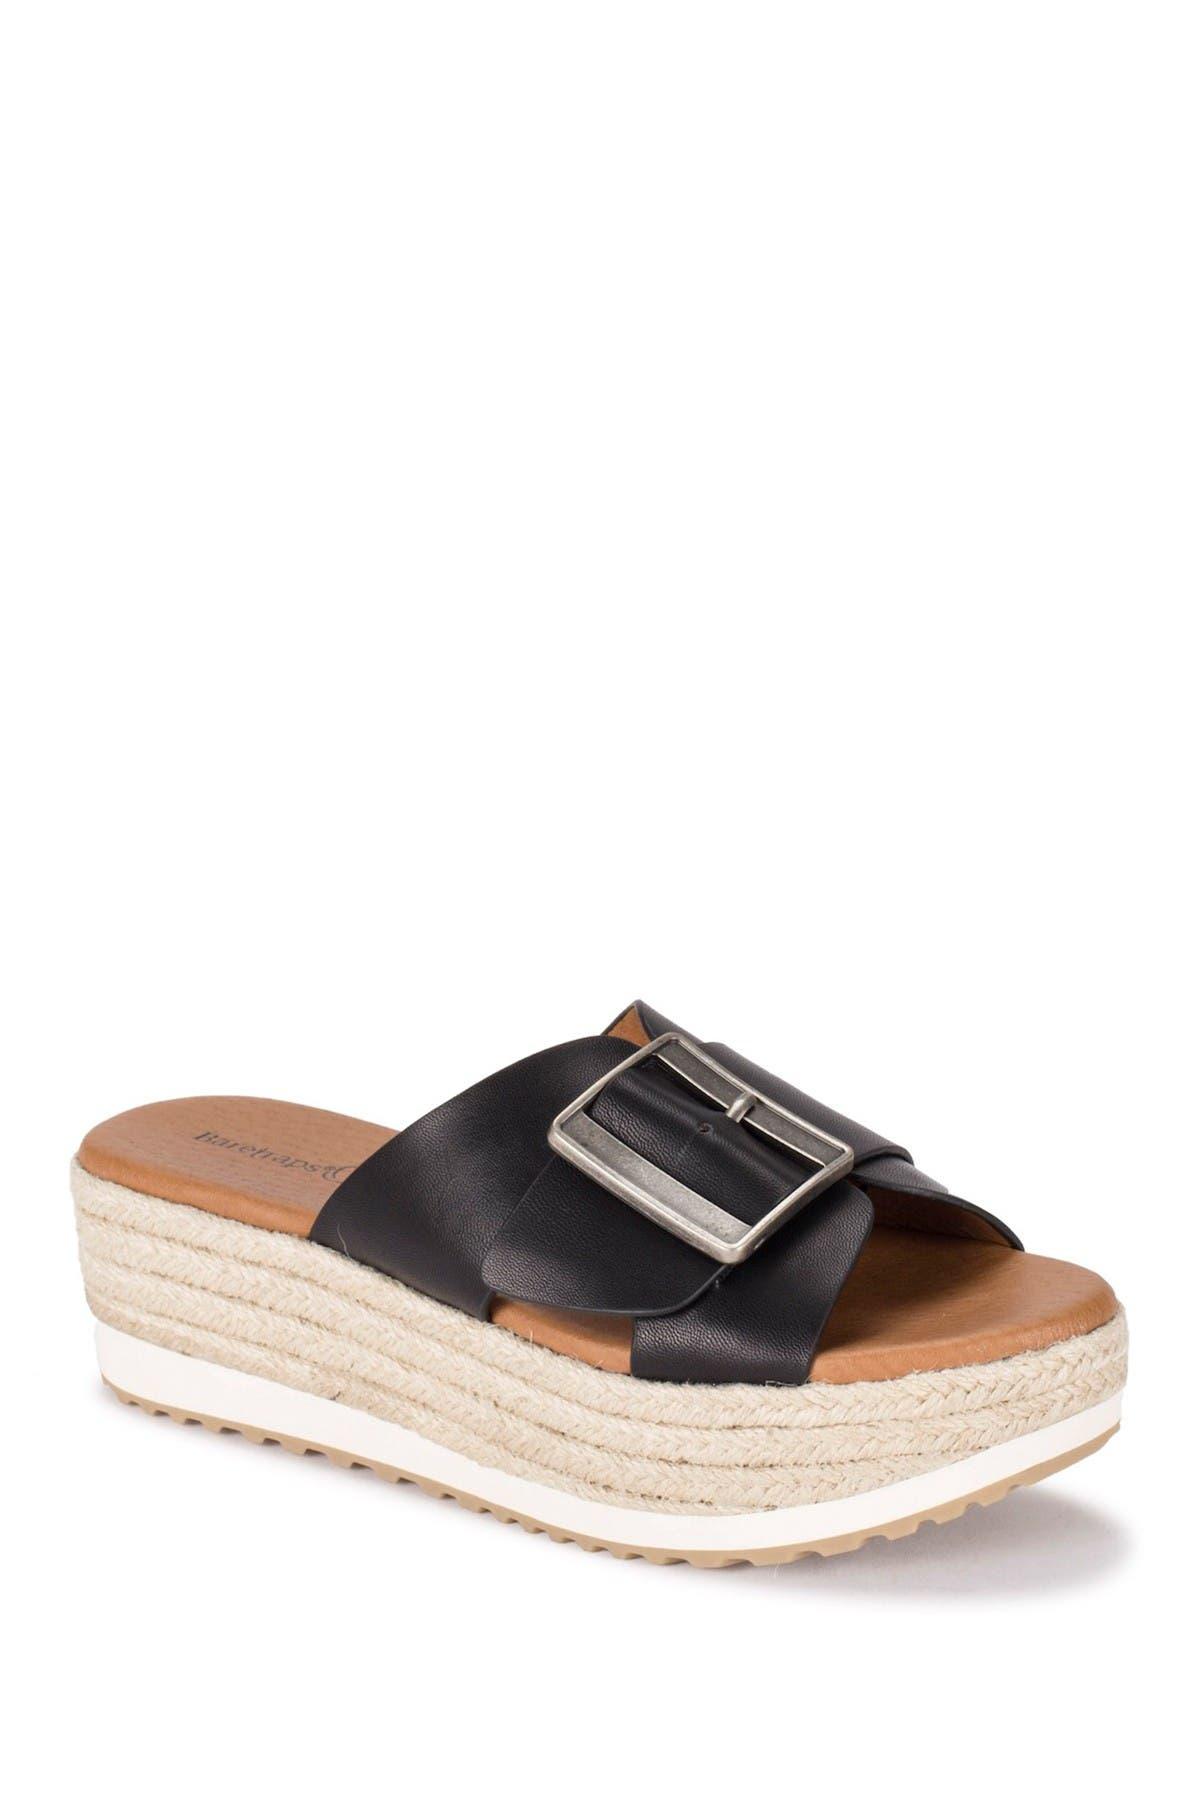 Image of BareTraps Walta Wedge Slide Sandal